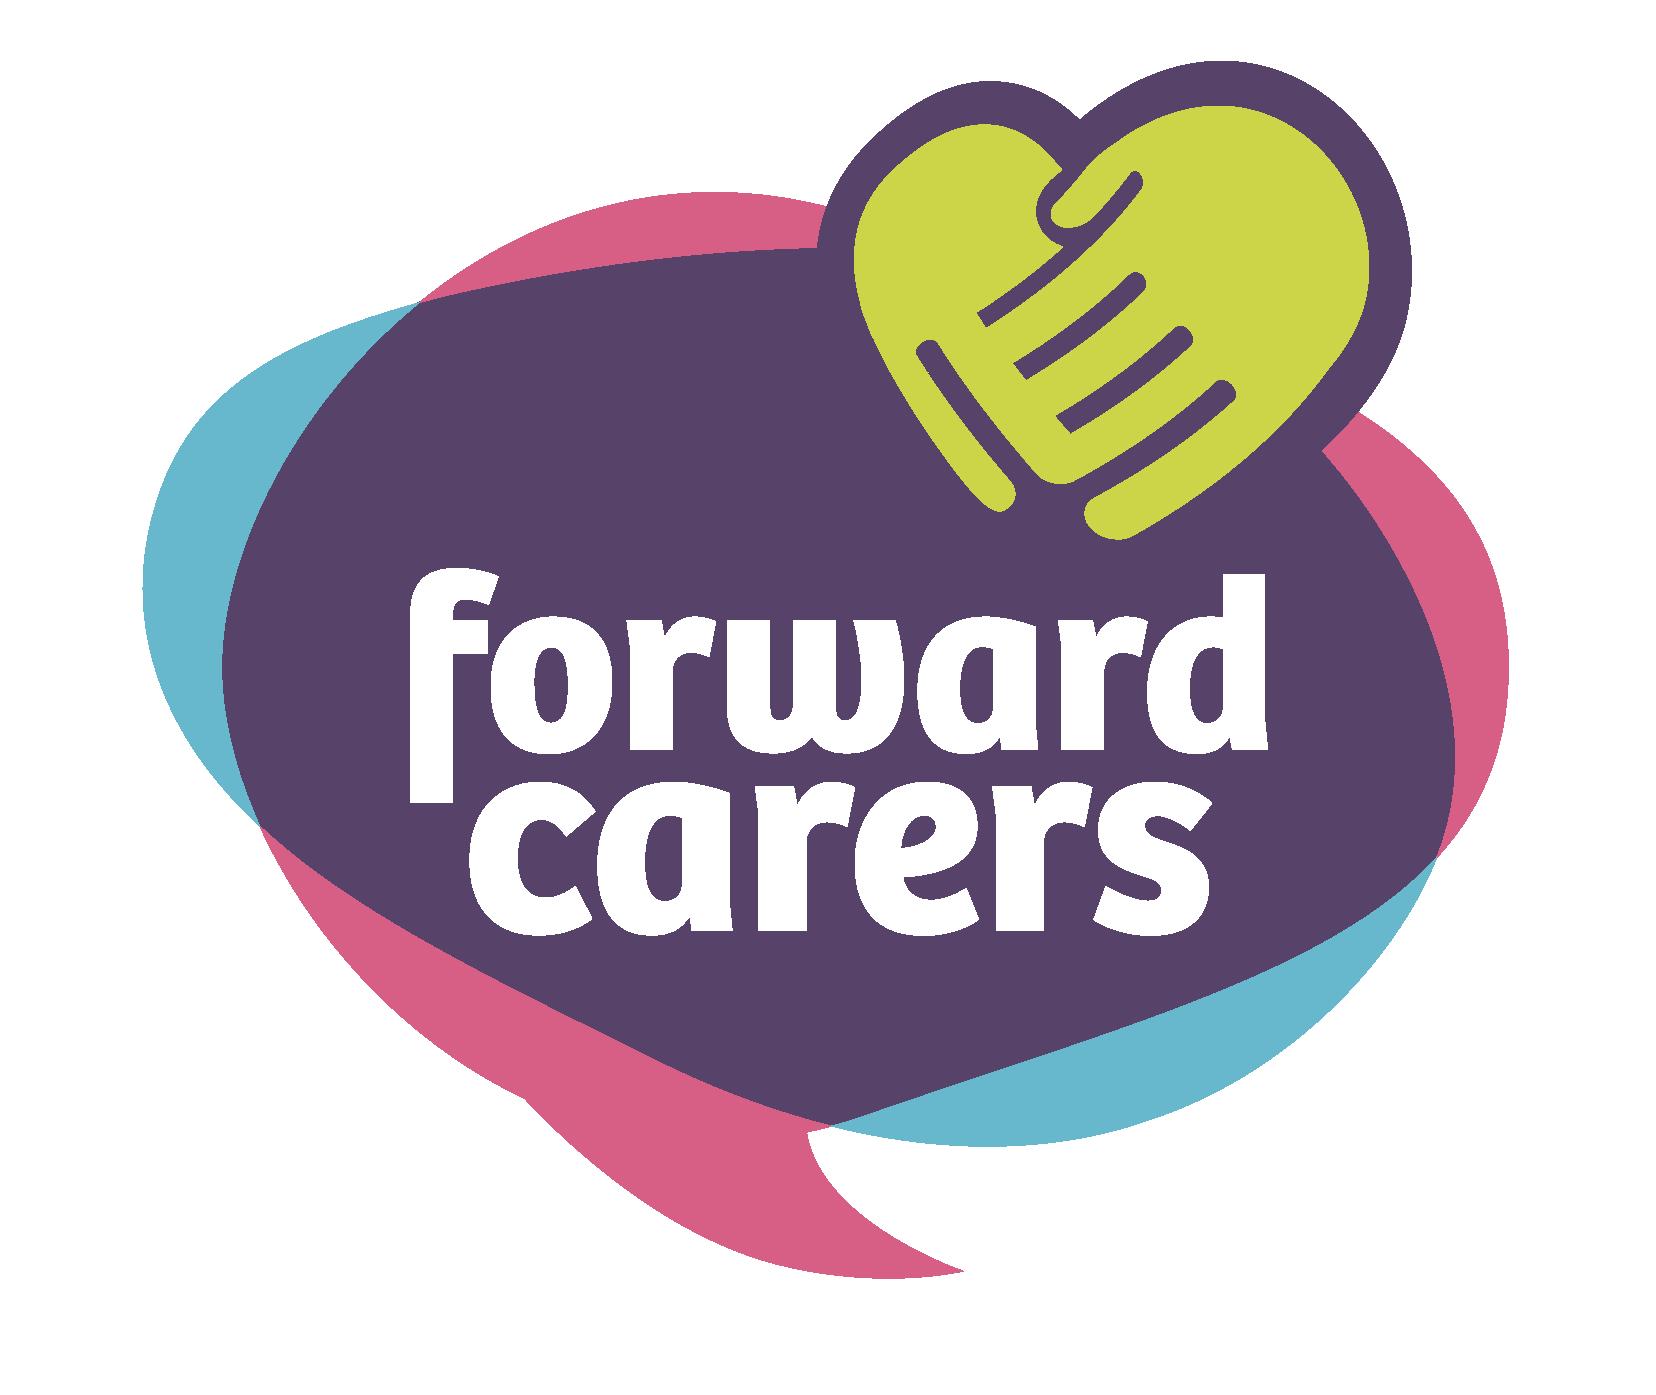 Forward Carers logo